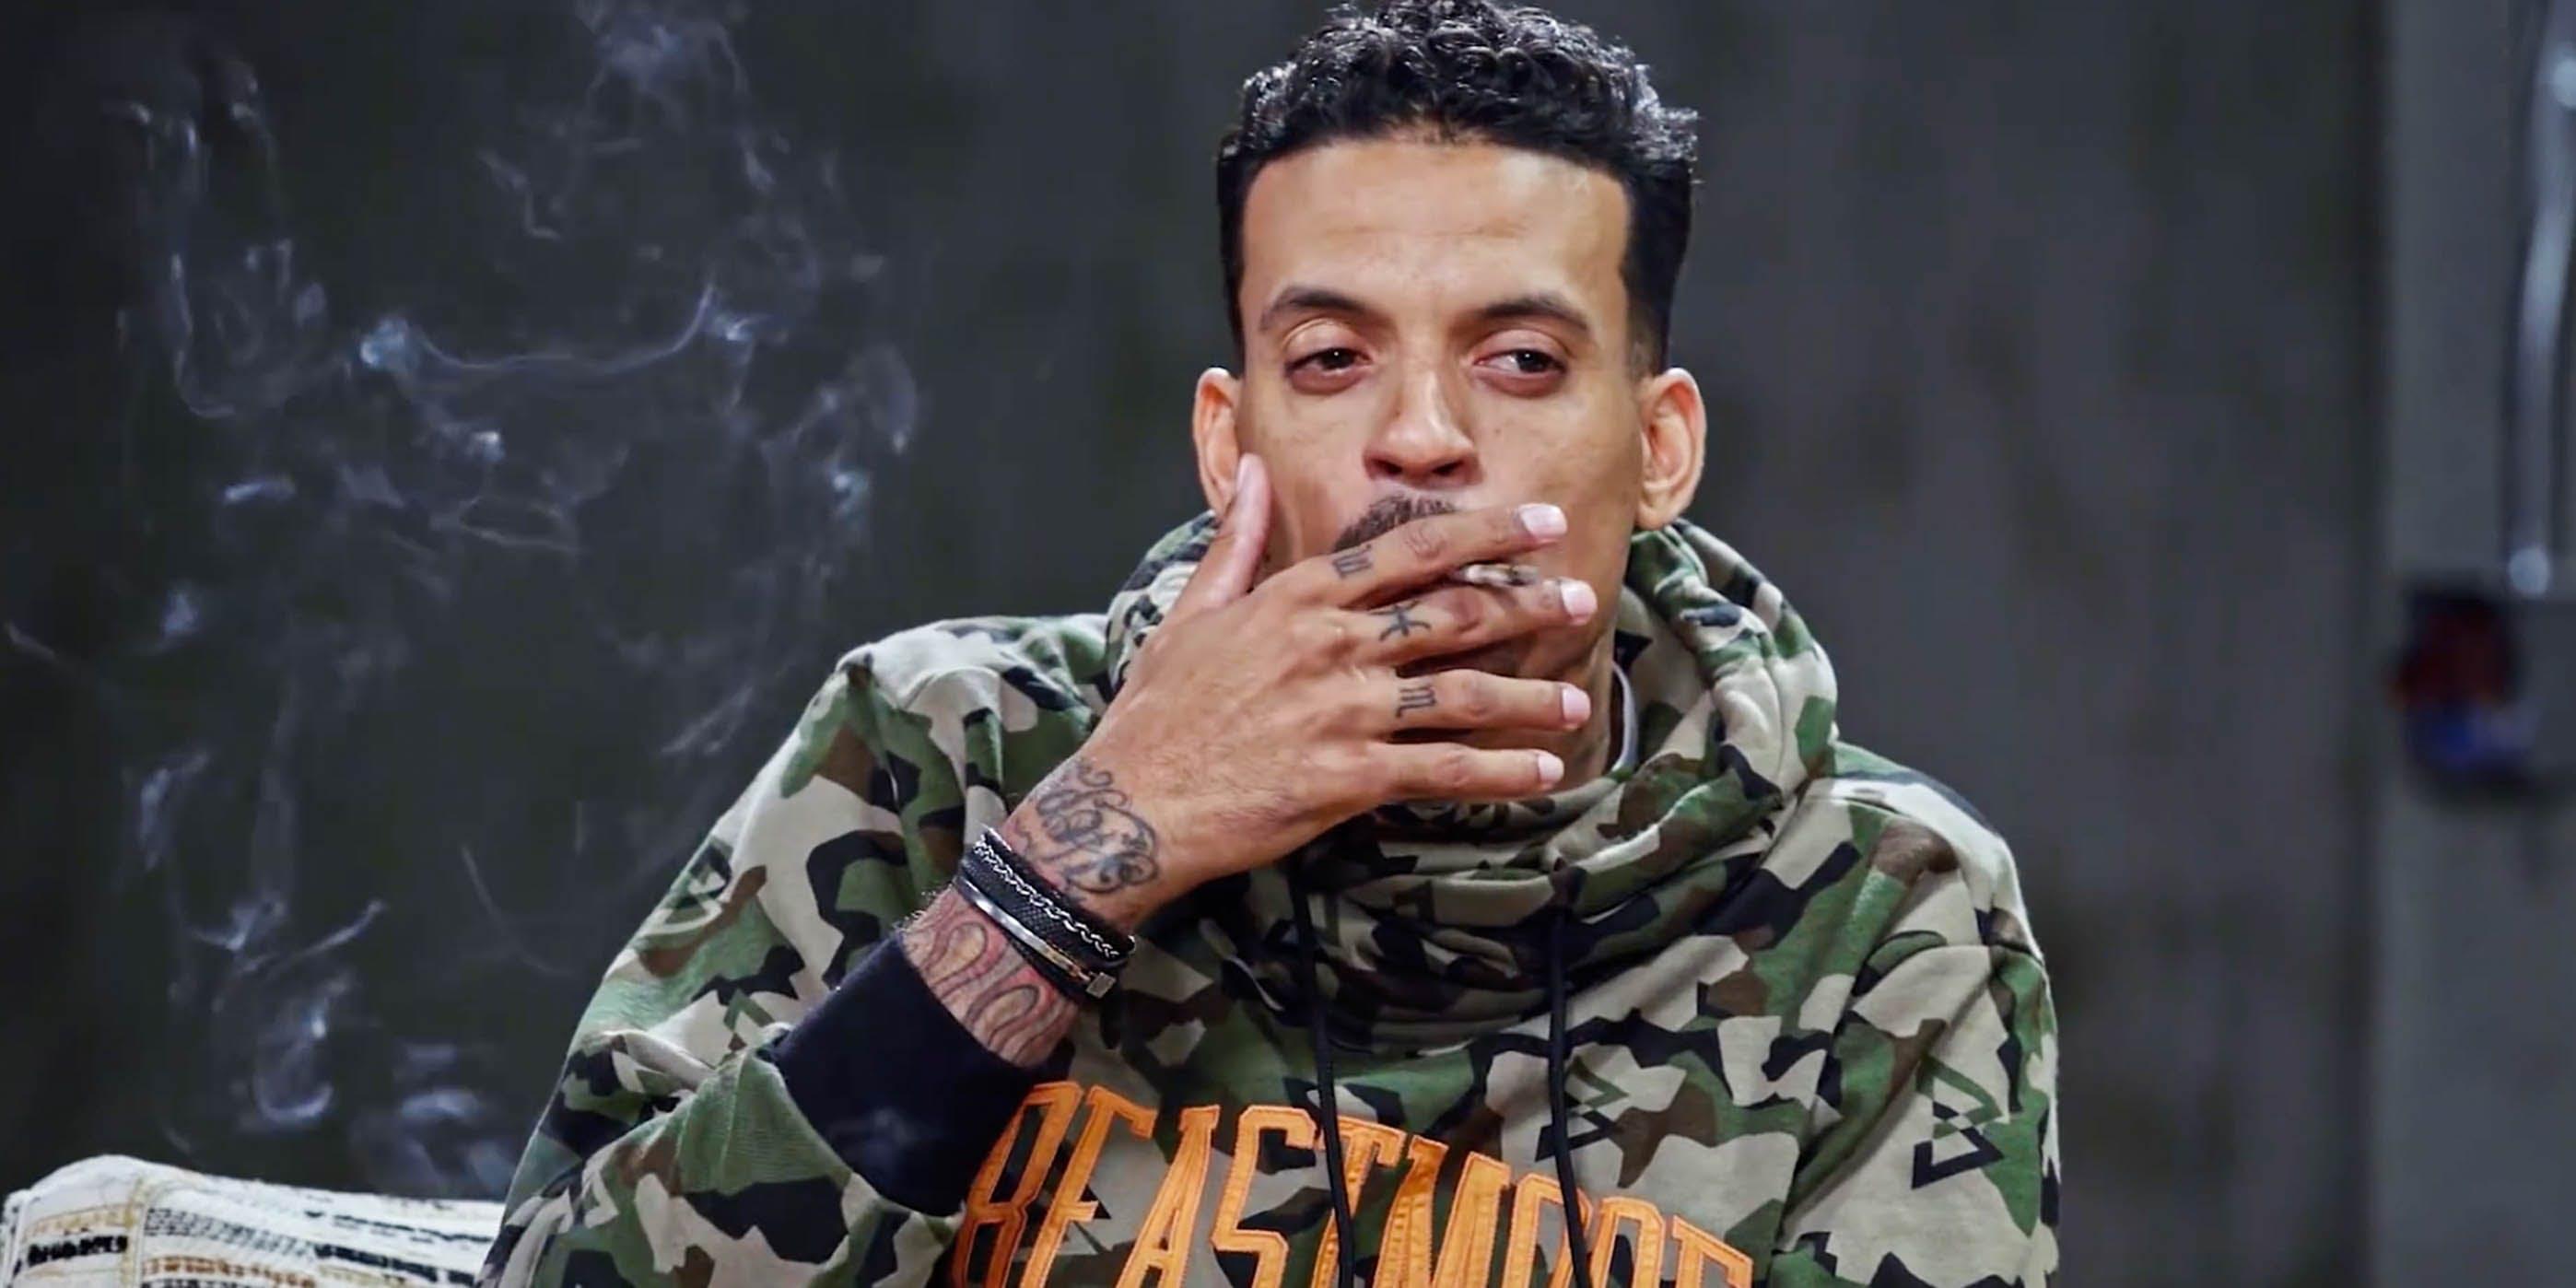 Professional athletes admit to smoking weed